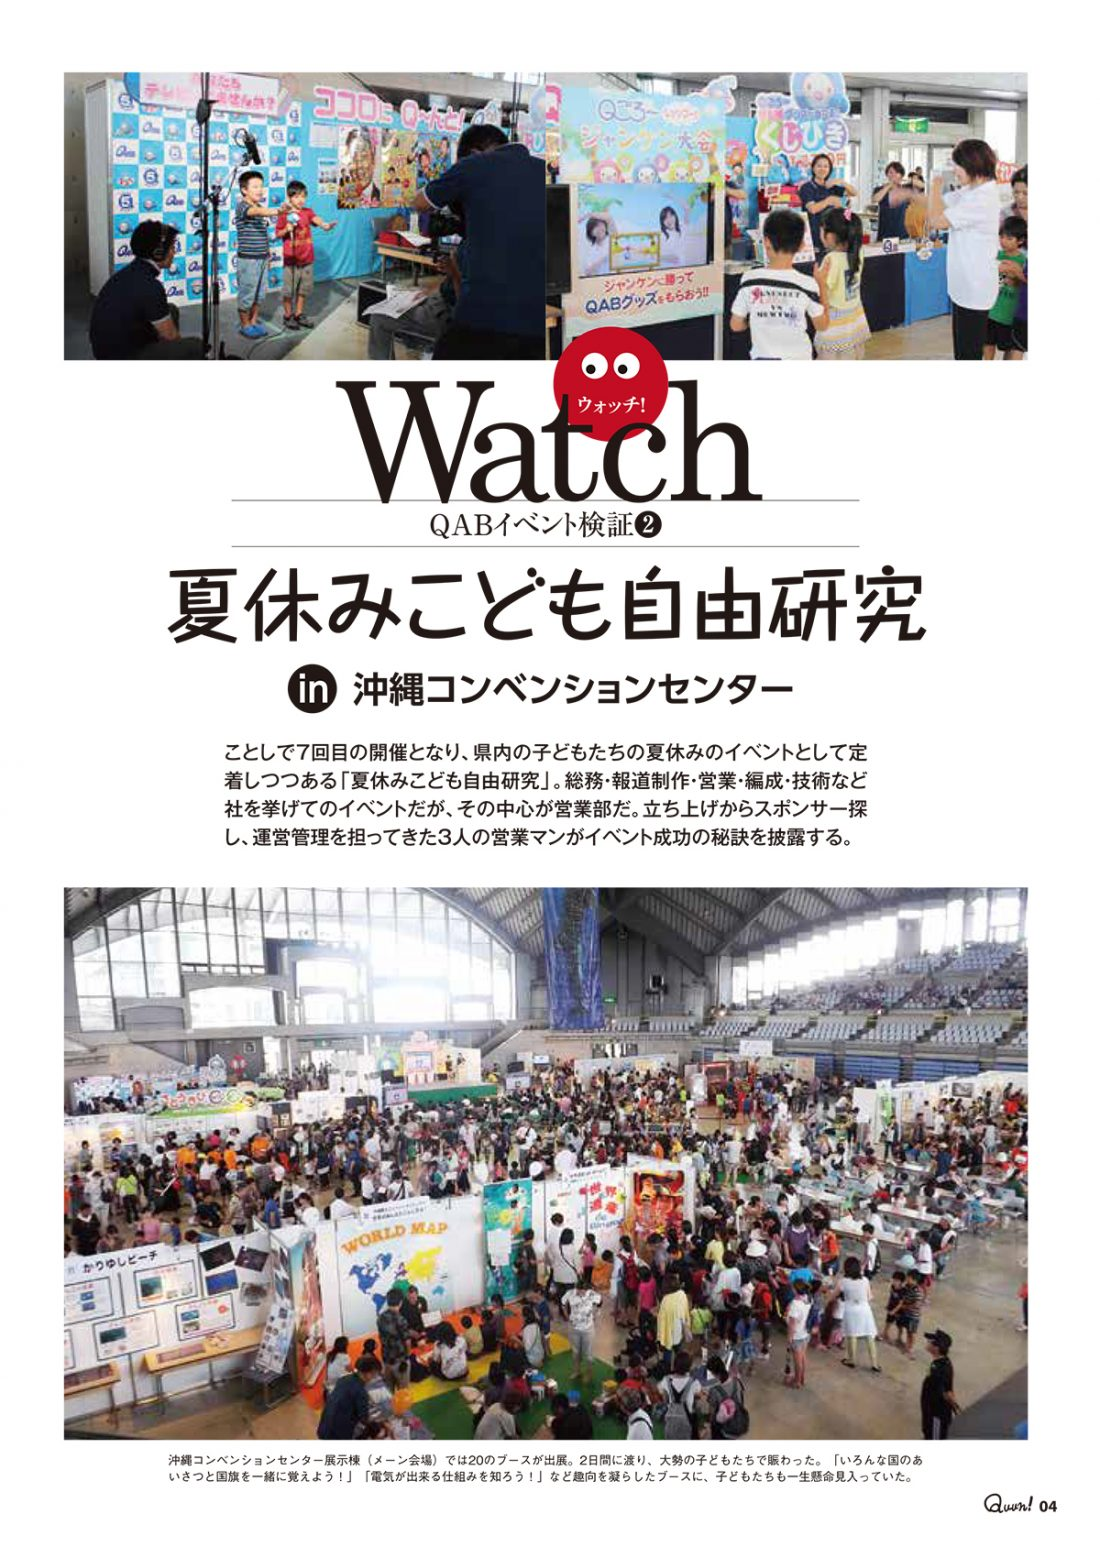 https://www.qab.co.jp/qgoro/wp-content/uploads/quun_0206-1100x1558.jpg